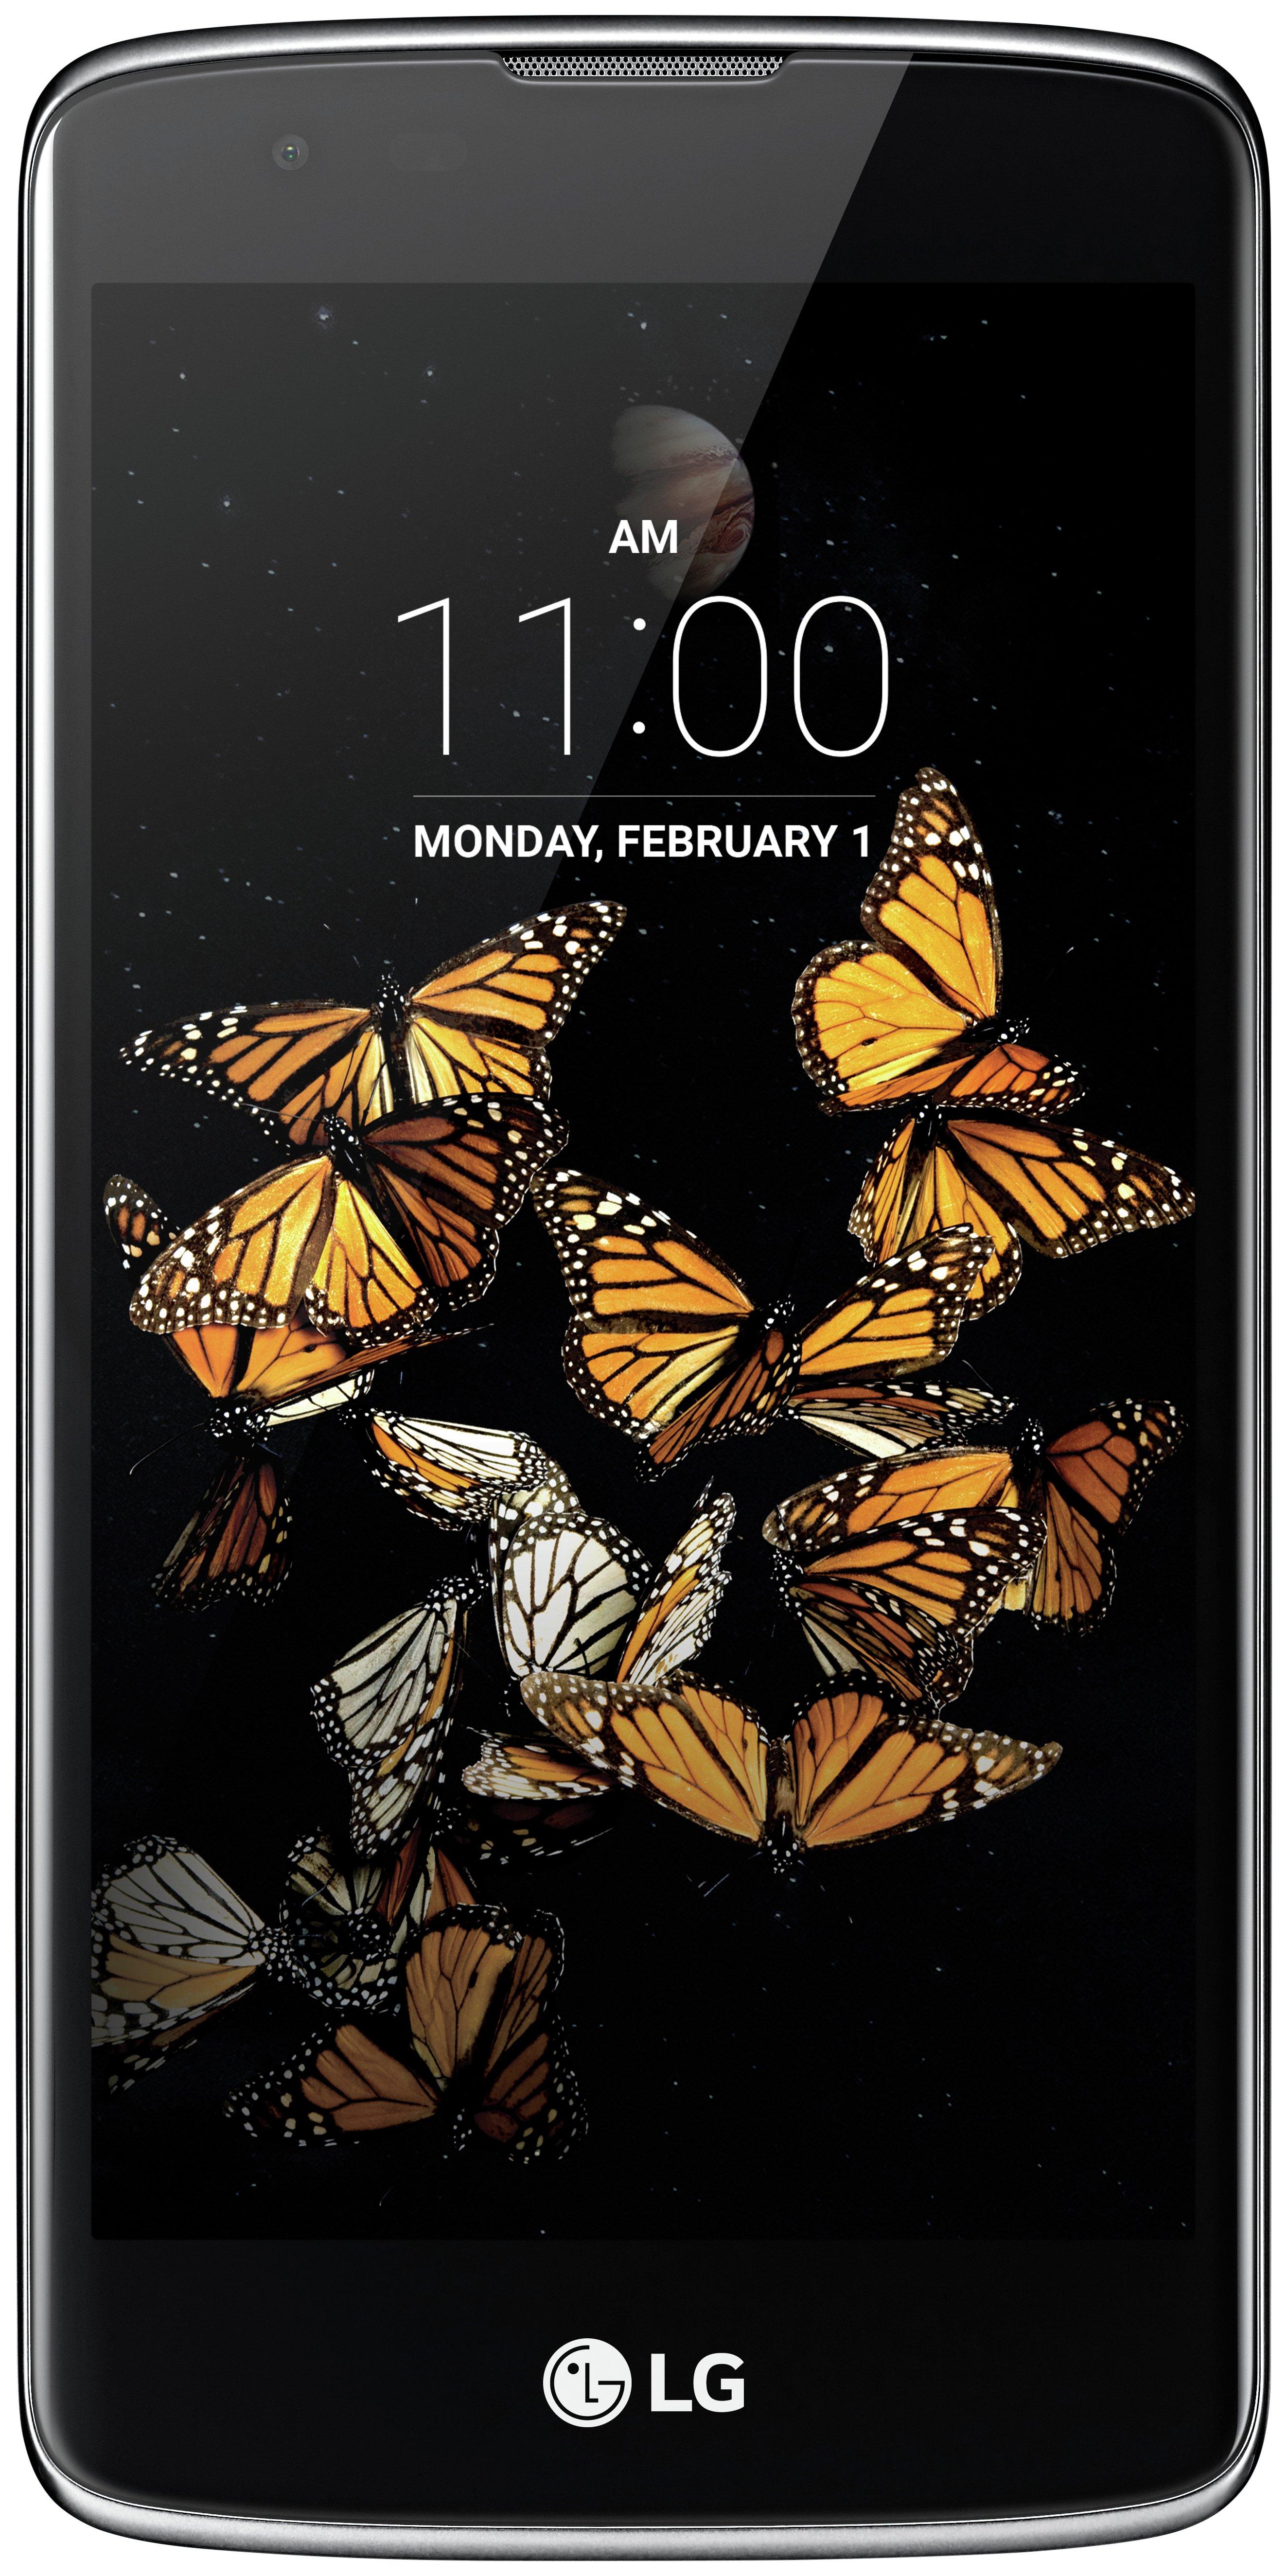 LG Sim Free LG K8 Mobile Phone - Black.